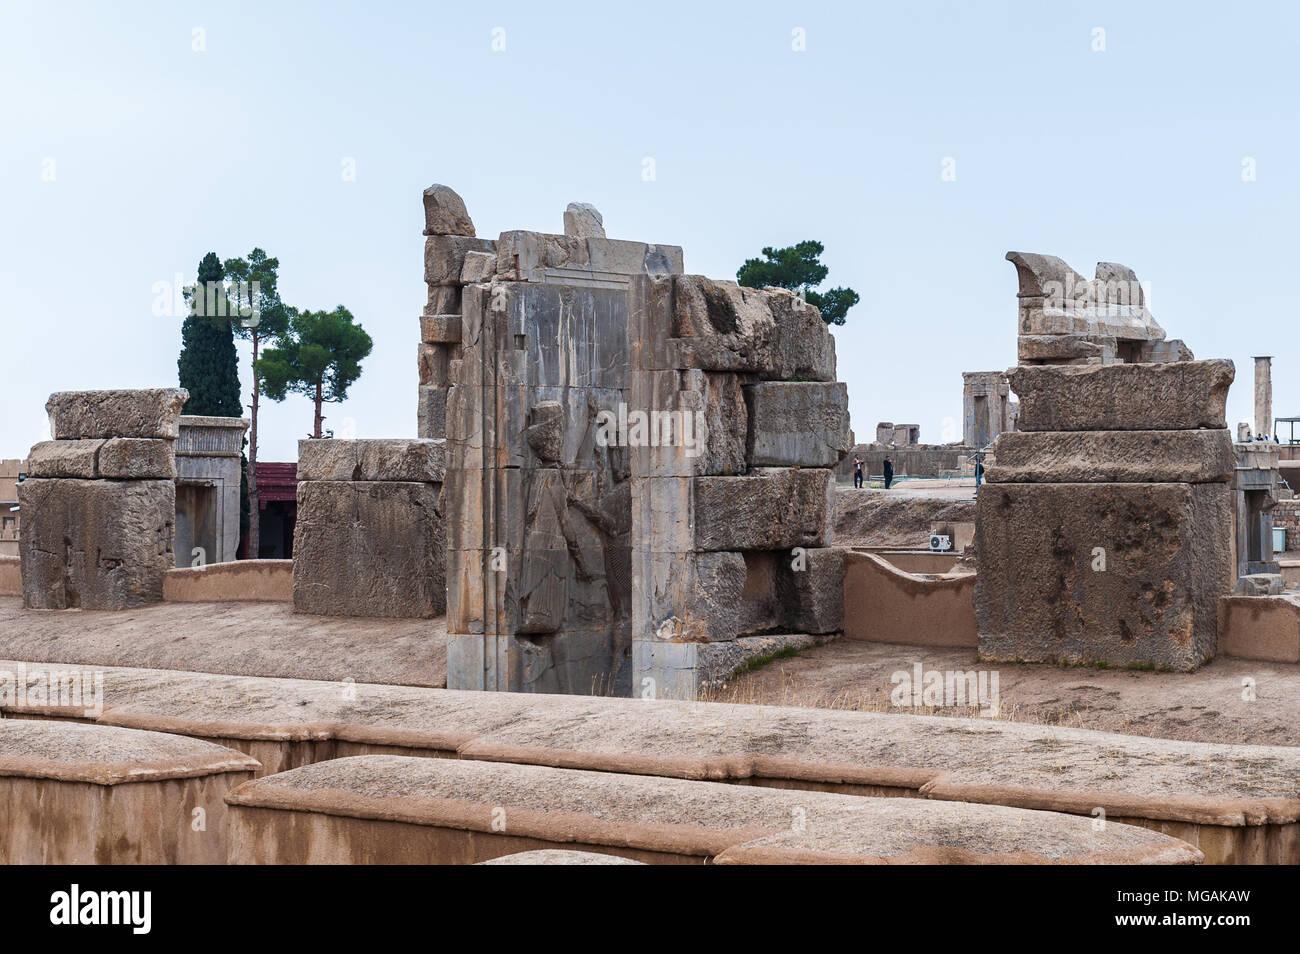 Apadana Of Xerxes In The Ancient City Of Persepolis Iran Unesco World Heritage Site Stock Photo Alamy